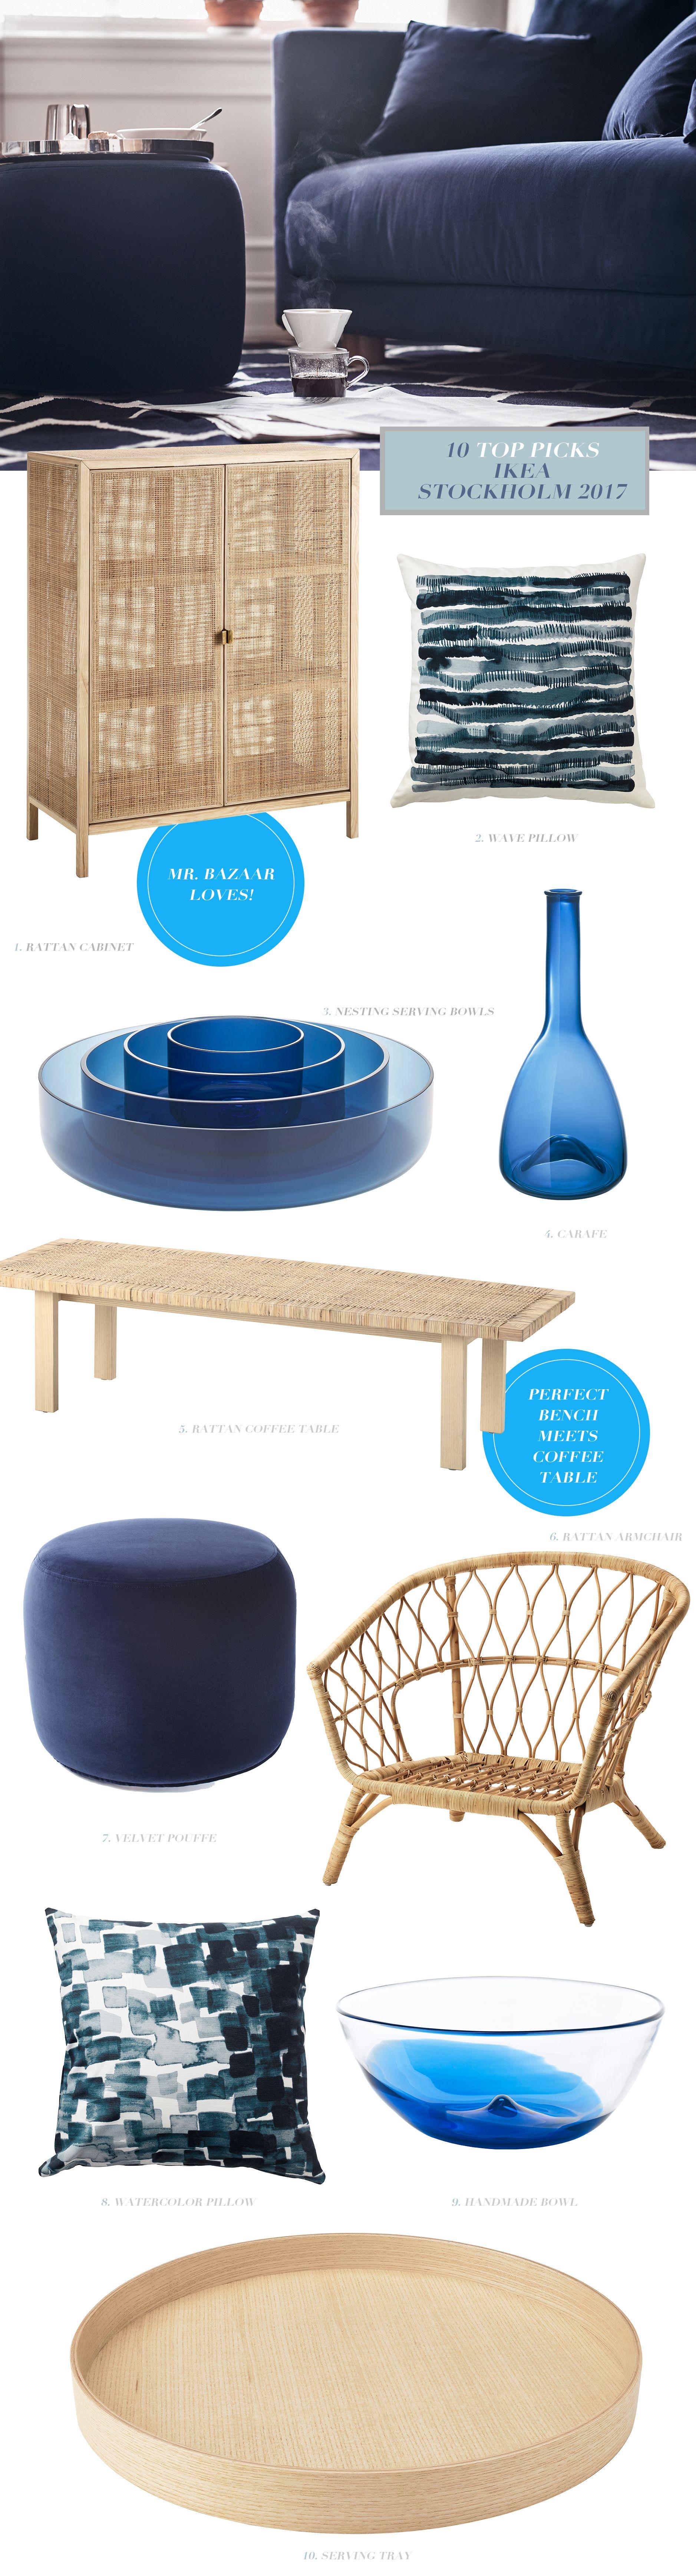 2234e0dedf17f124856ef0cfda469abb Frais De Table Bois Ikea Des Idées